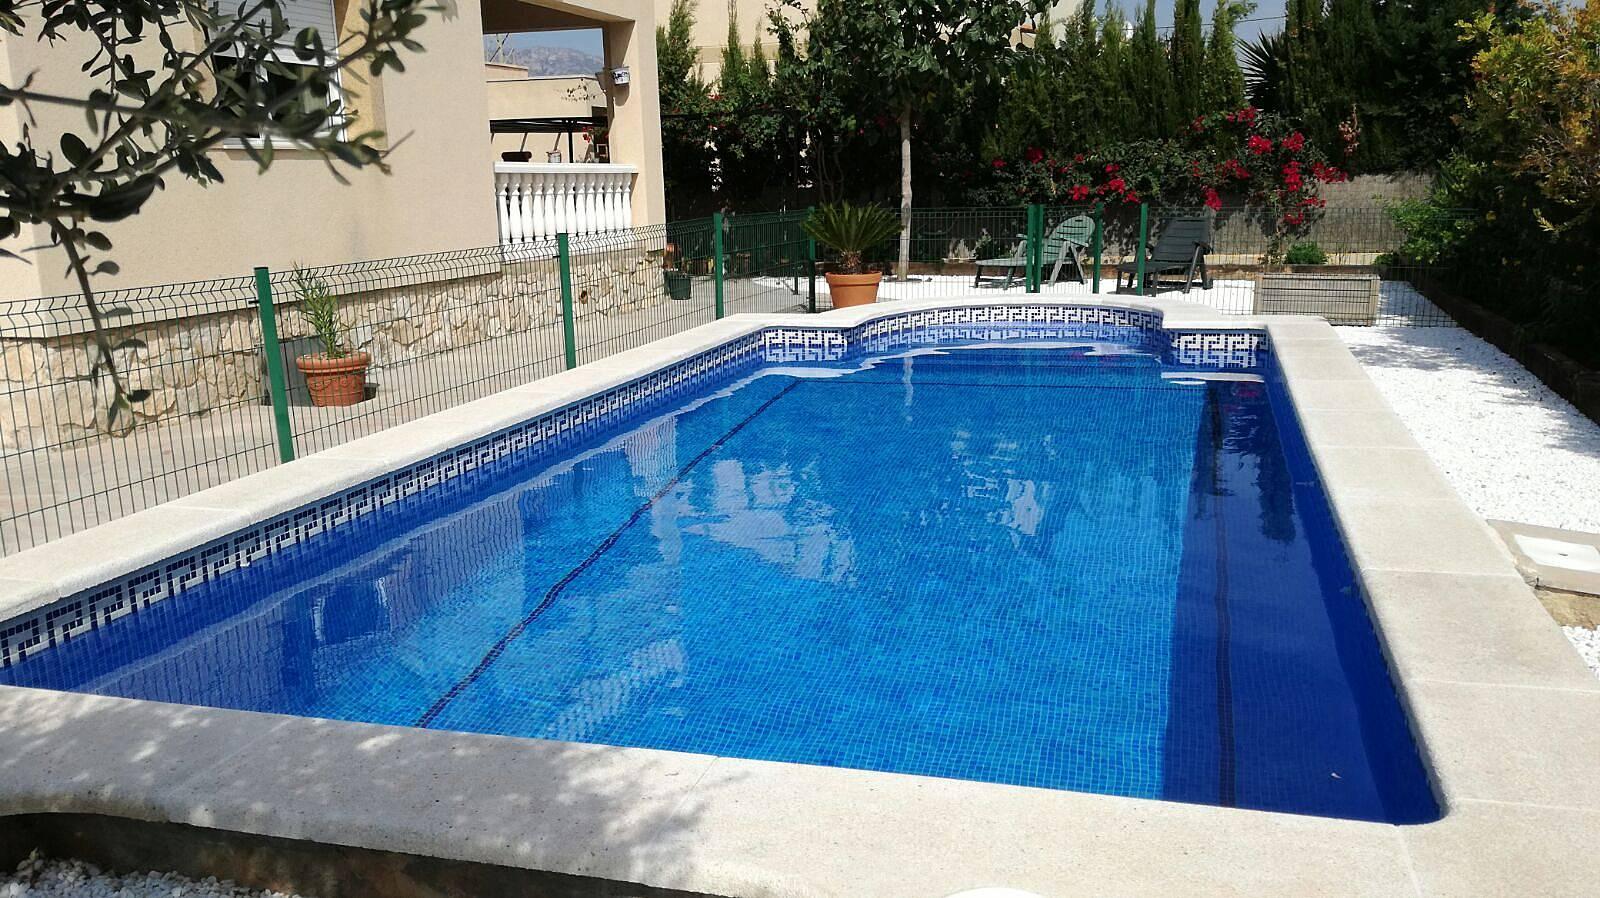 Chalet de 120m2 avec piscine priv e s curis e tres - Chalet avec piscine privee ...